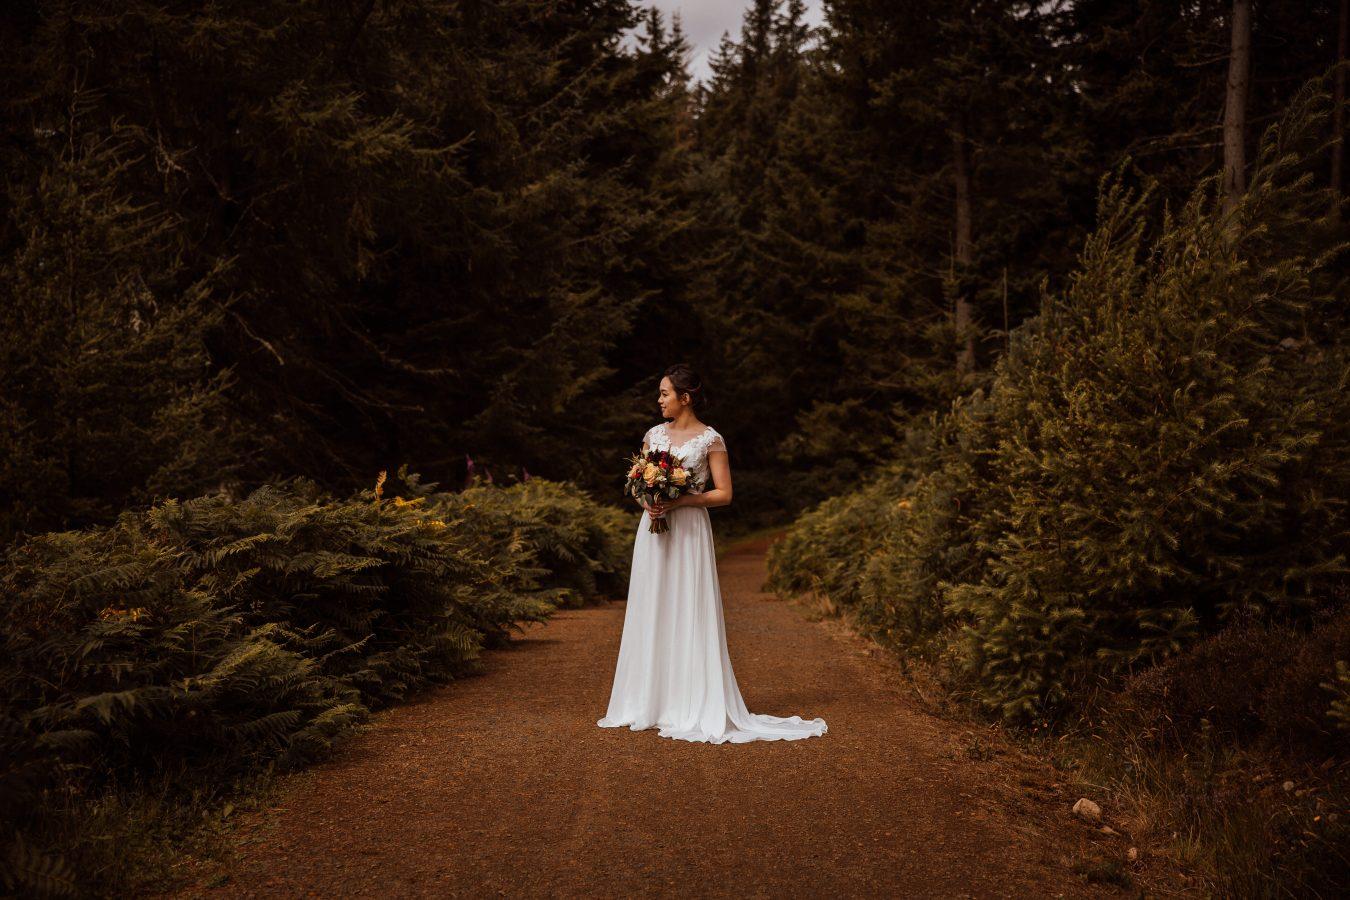 Josh-Li-Jules-Barron-Photographer-2018-11